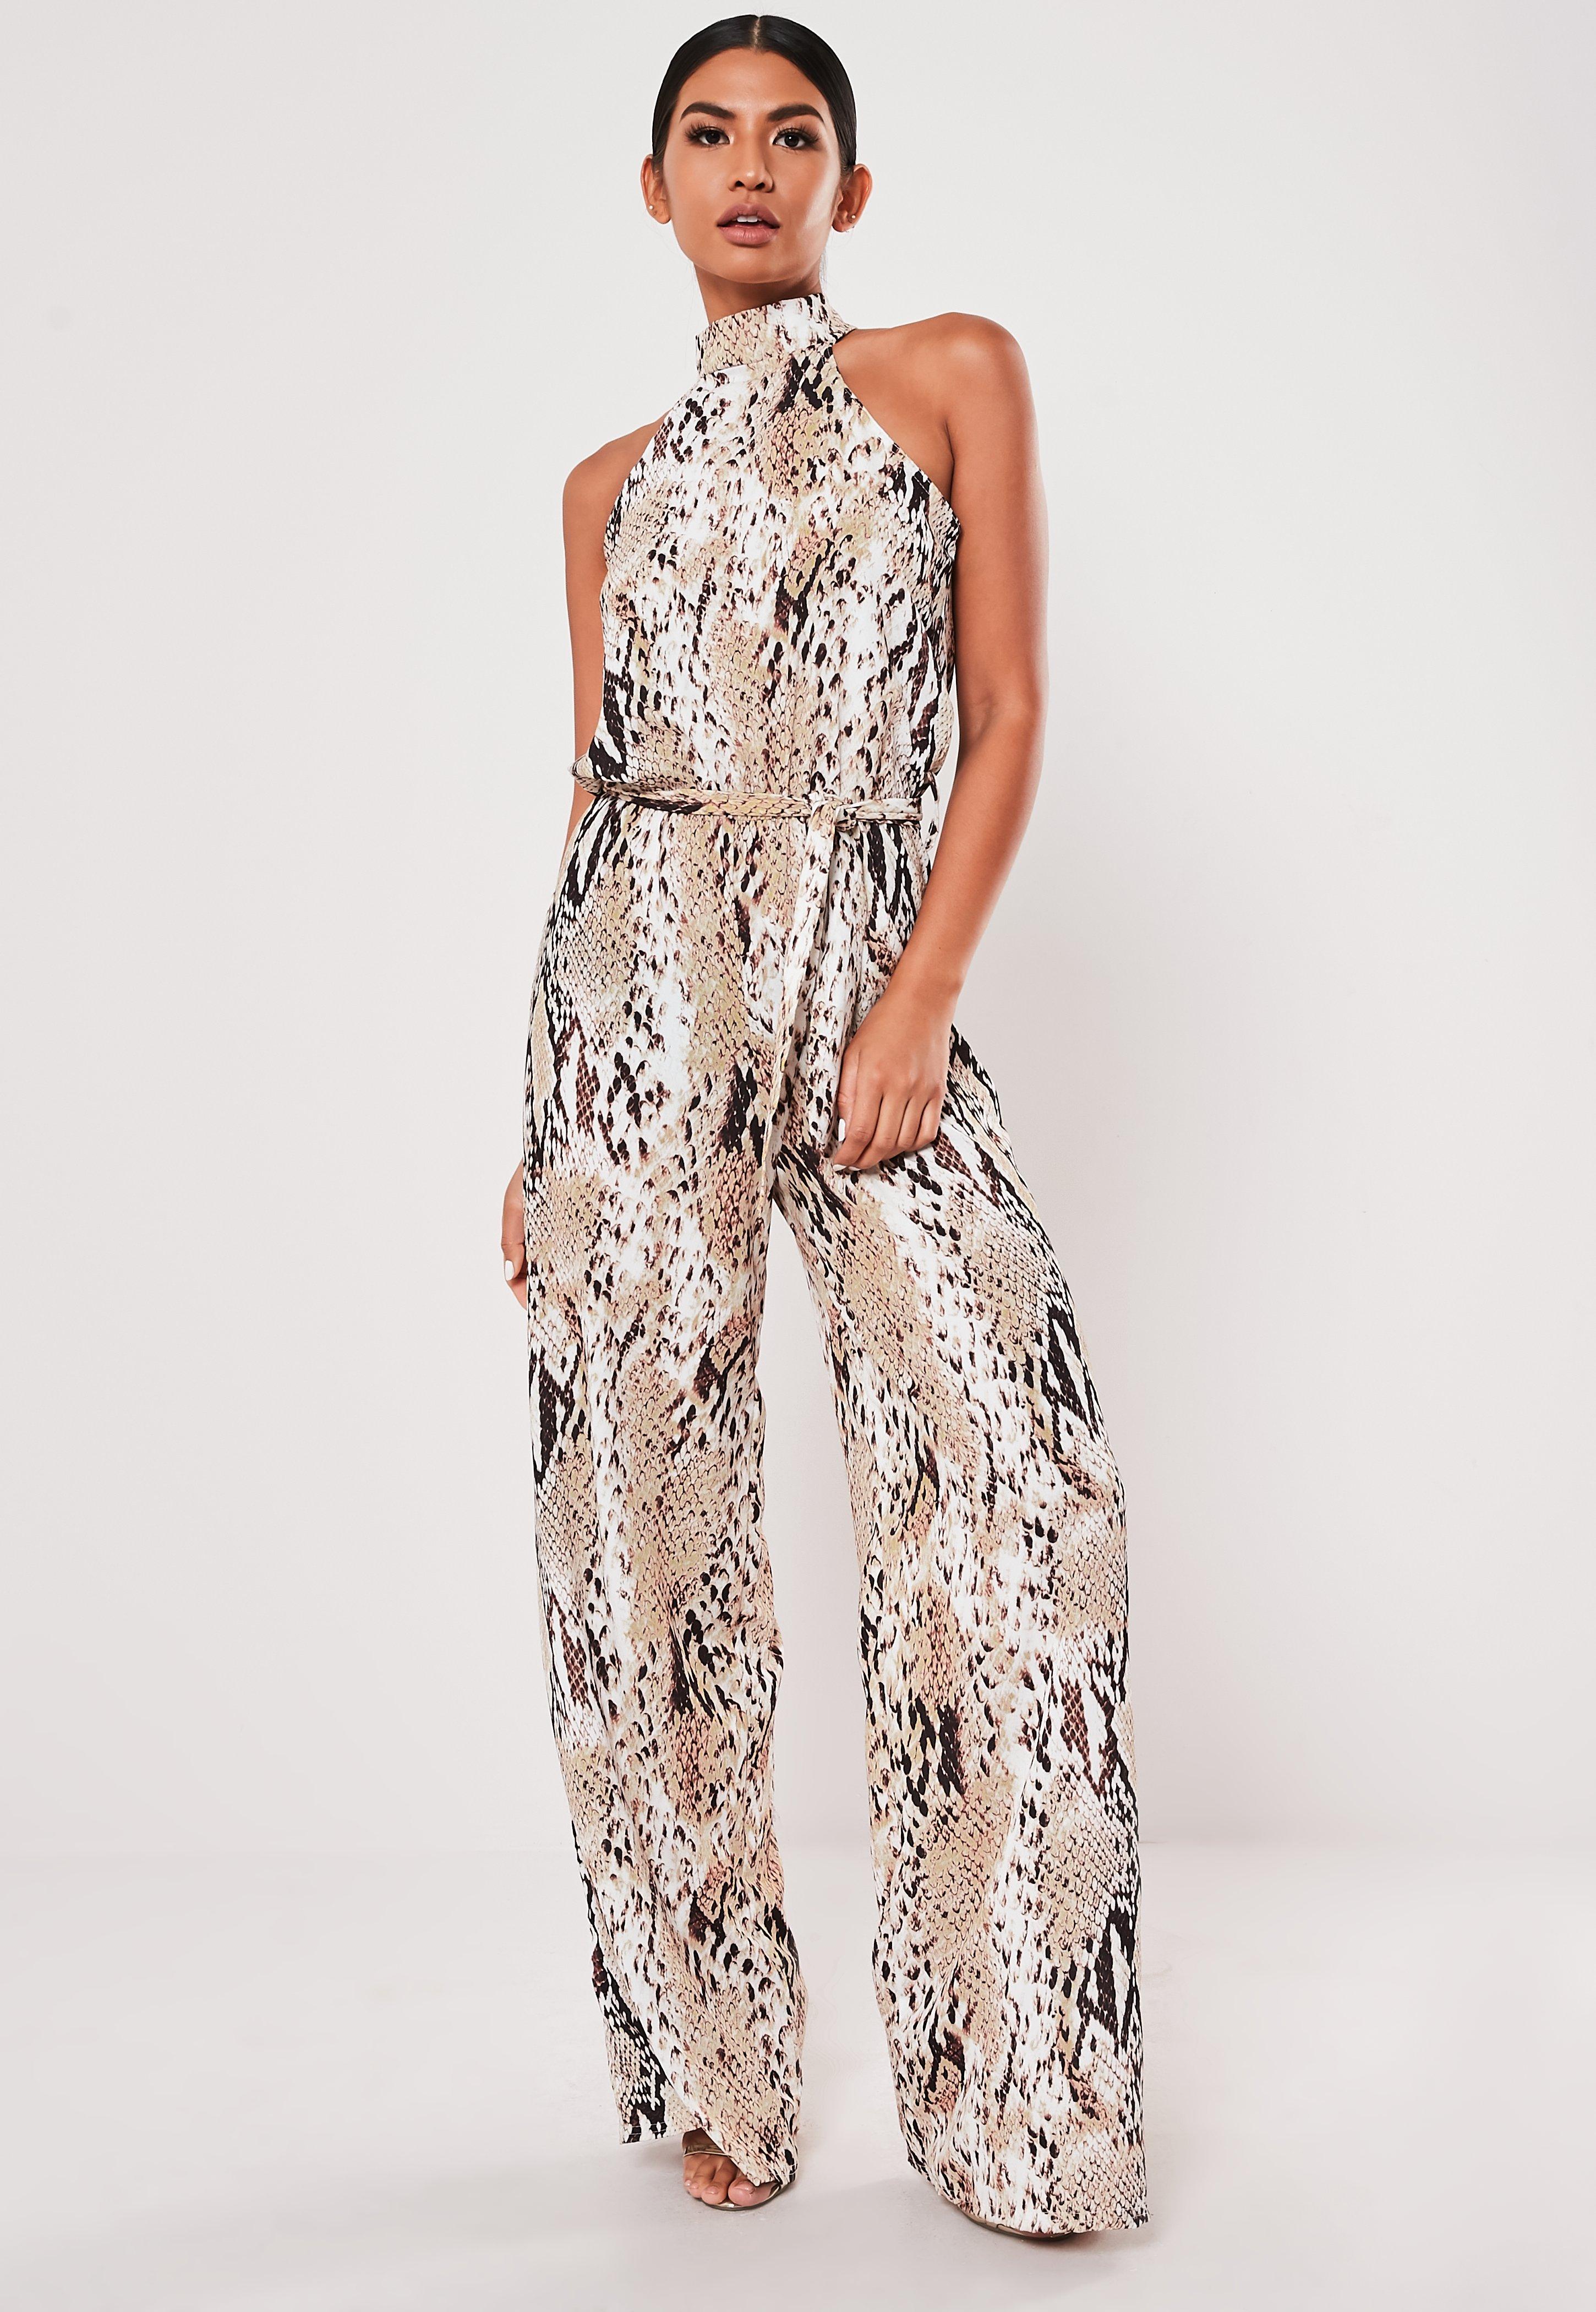 5ea96cc53b Snakeskin Clothes | Snakeskin Dresses & Skirts - Missguided